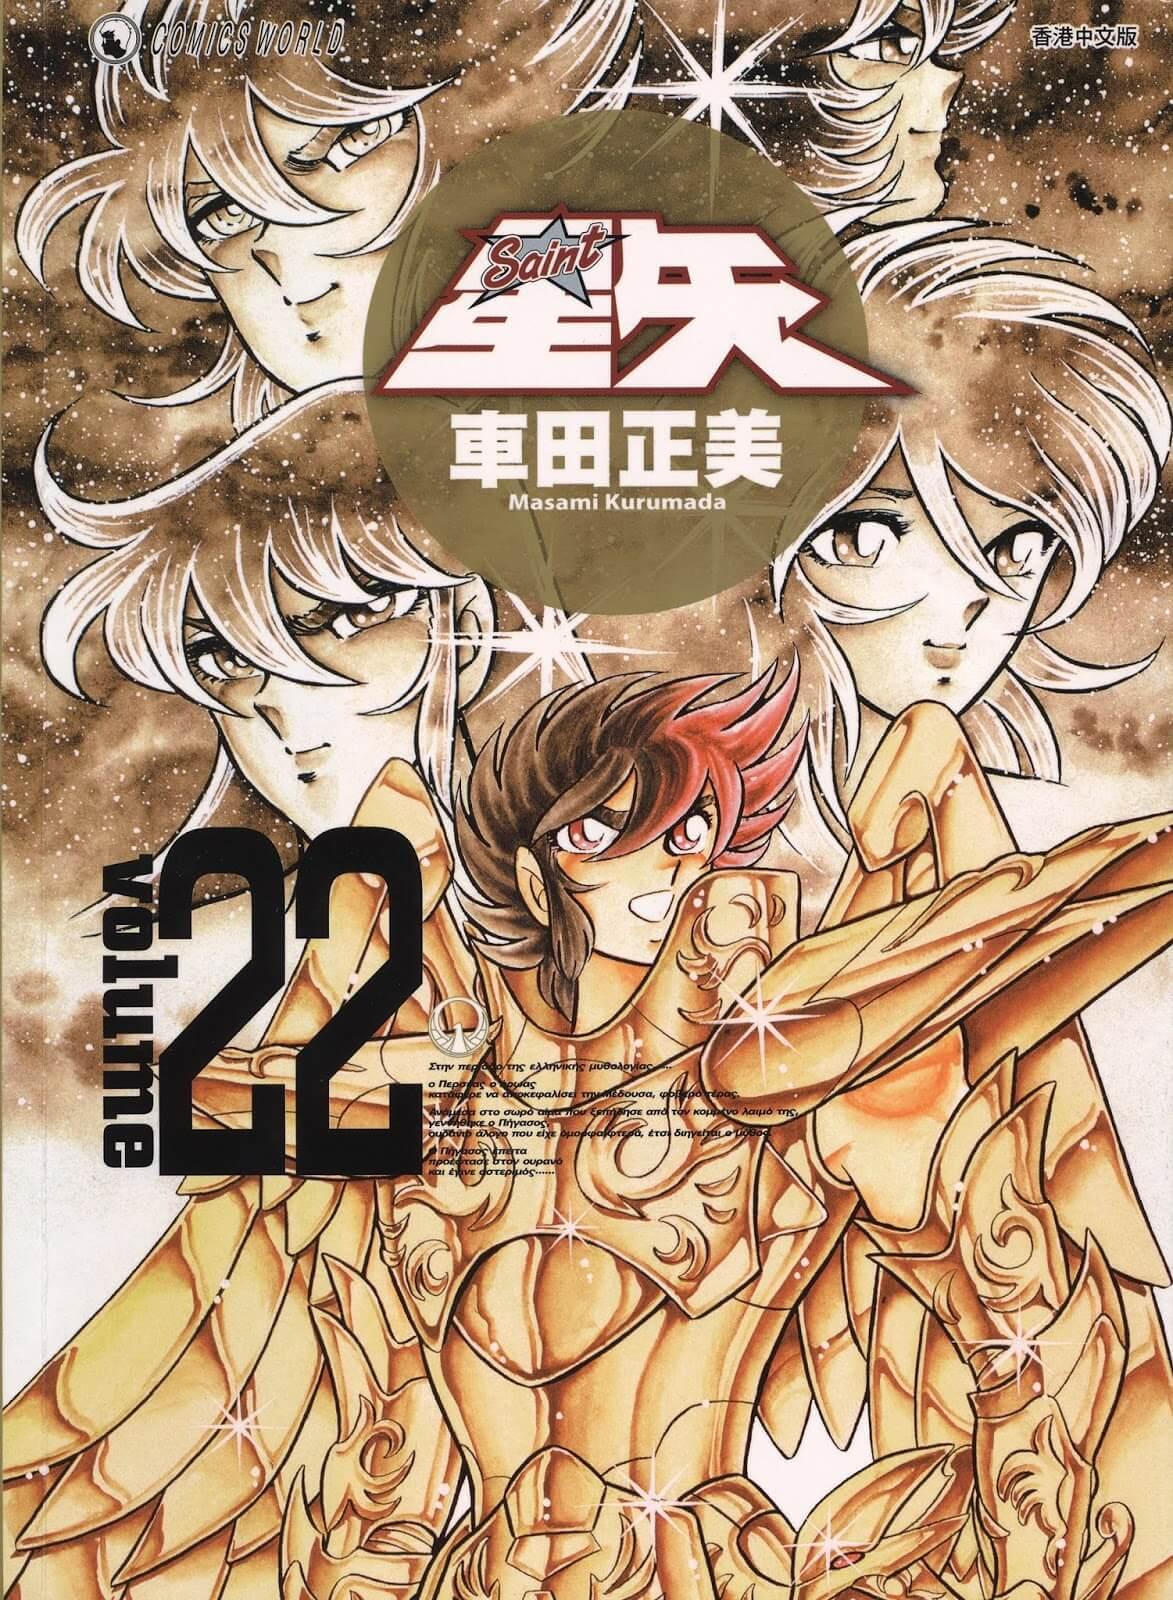 Descargar manga de Saint Seiya en PDF por Mega y Mediafire manga completo en español